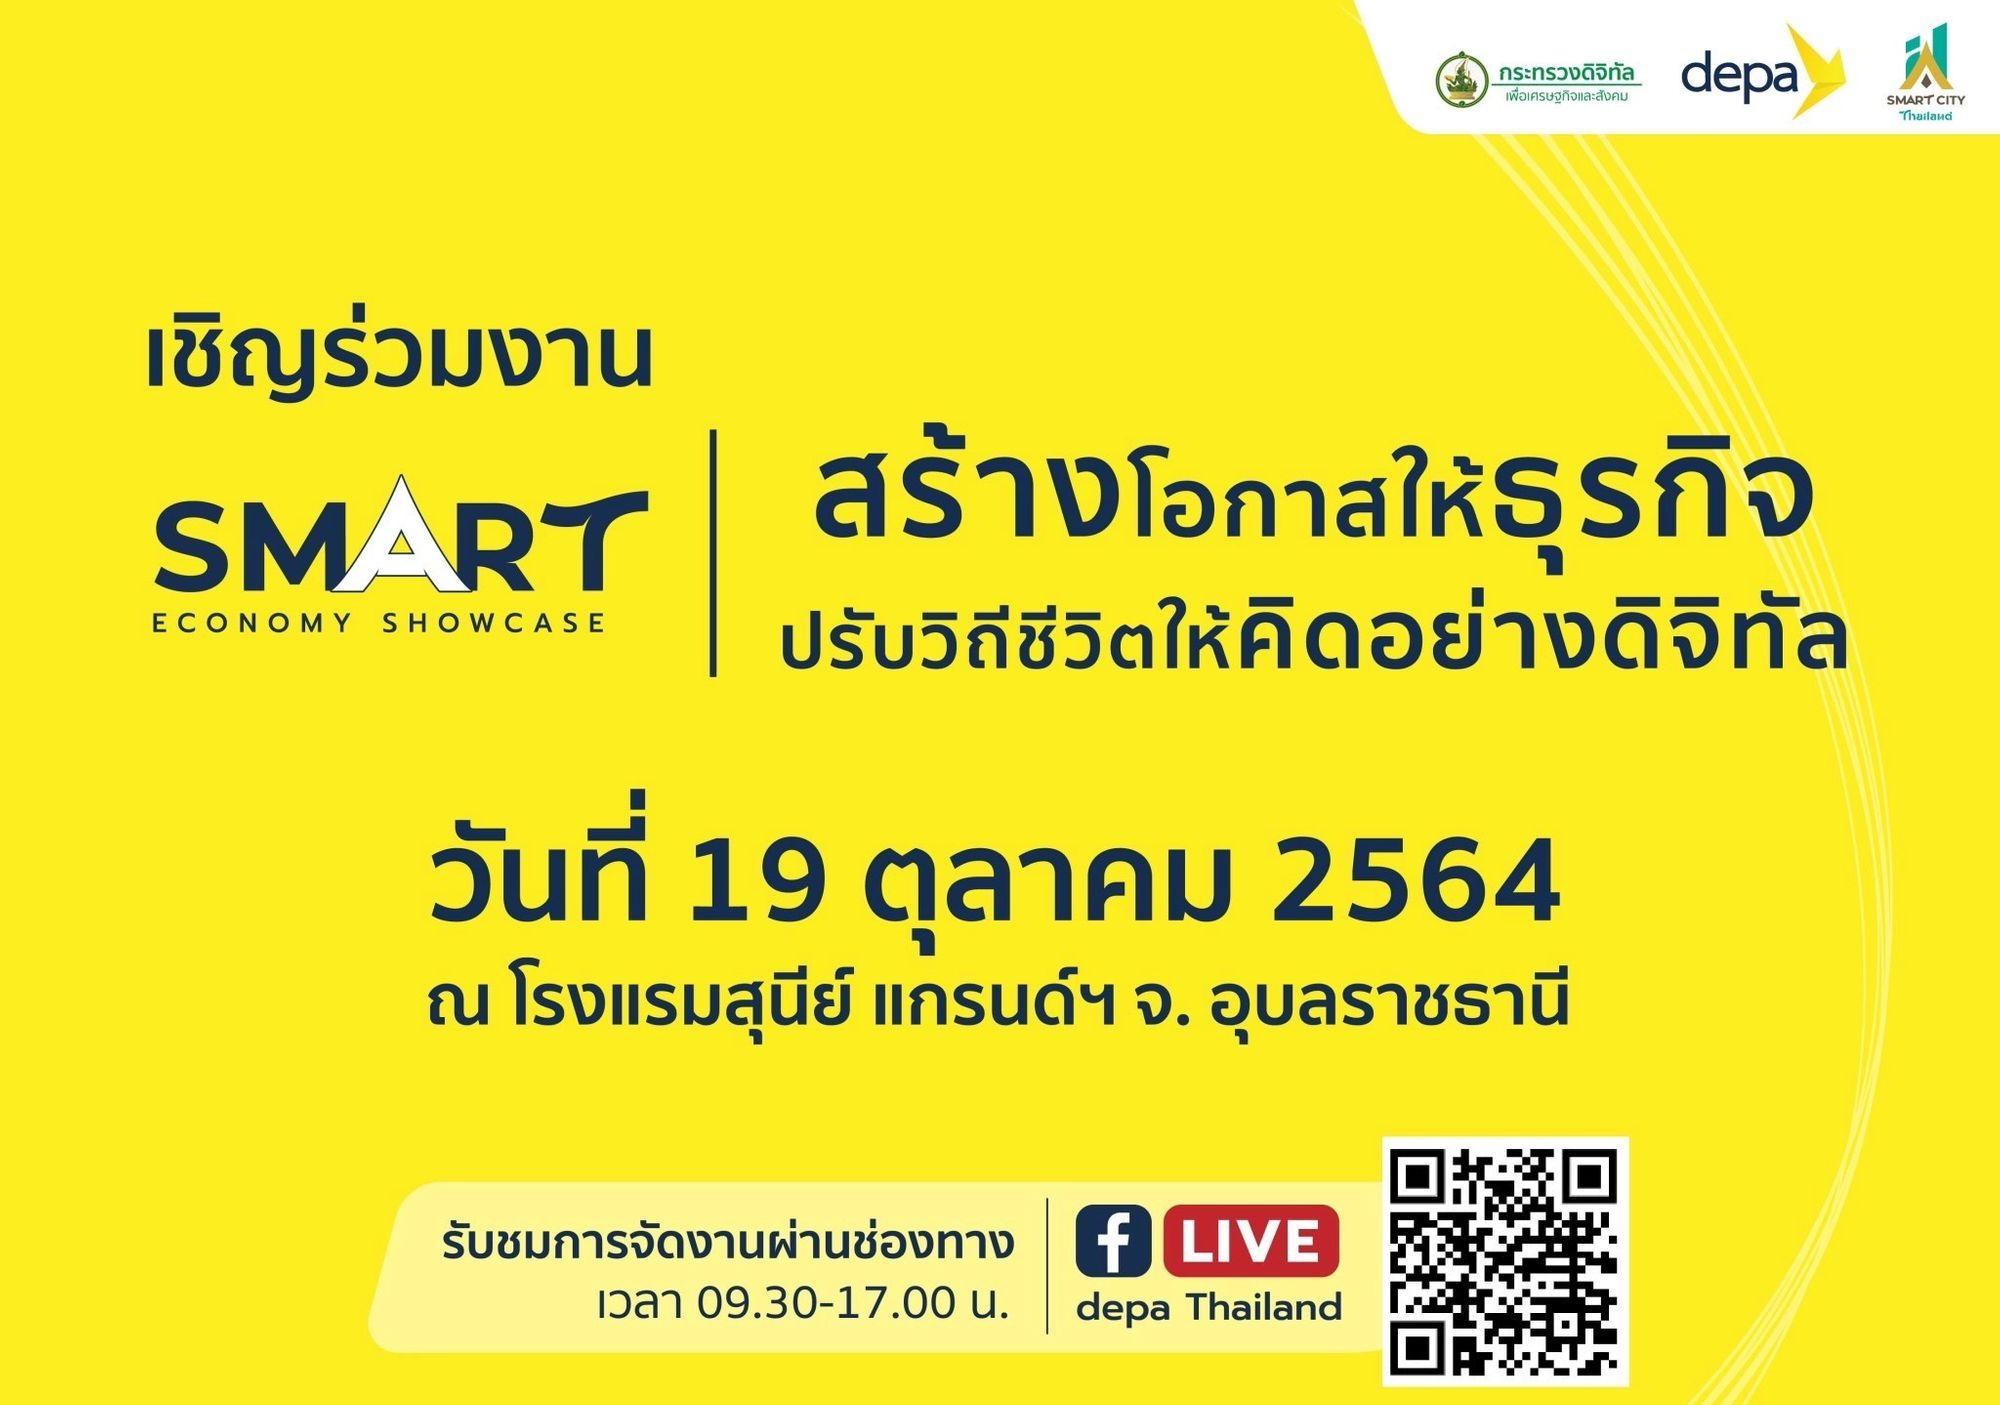 depa จัดงาน Smart Economy Showcase จังหวัดอุบล 19 ตุลานี้